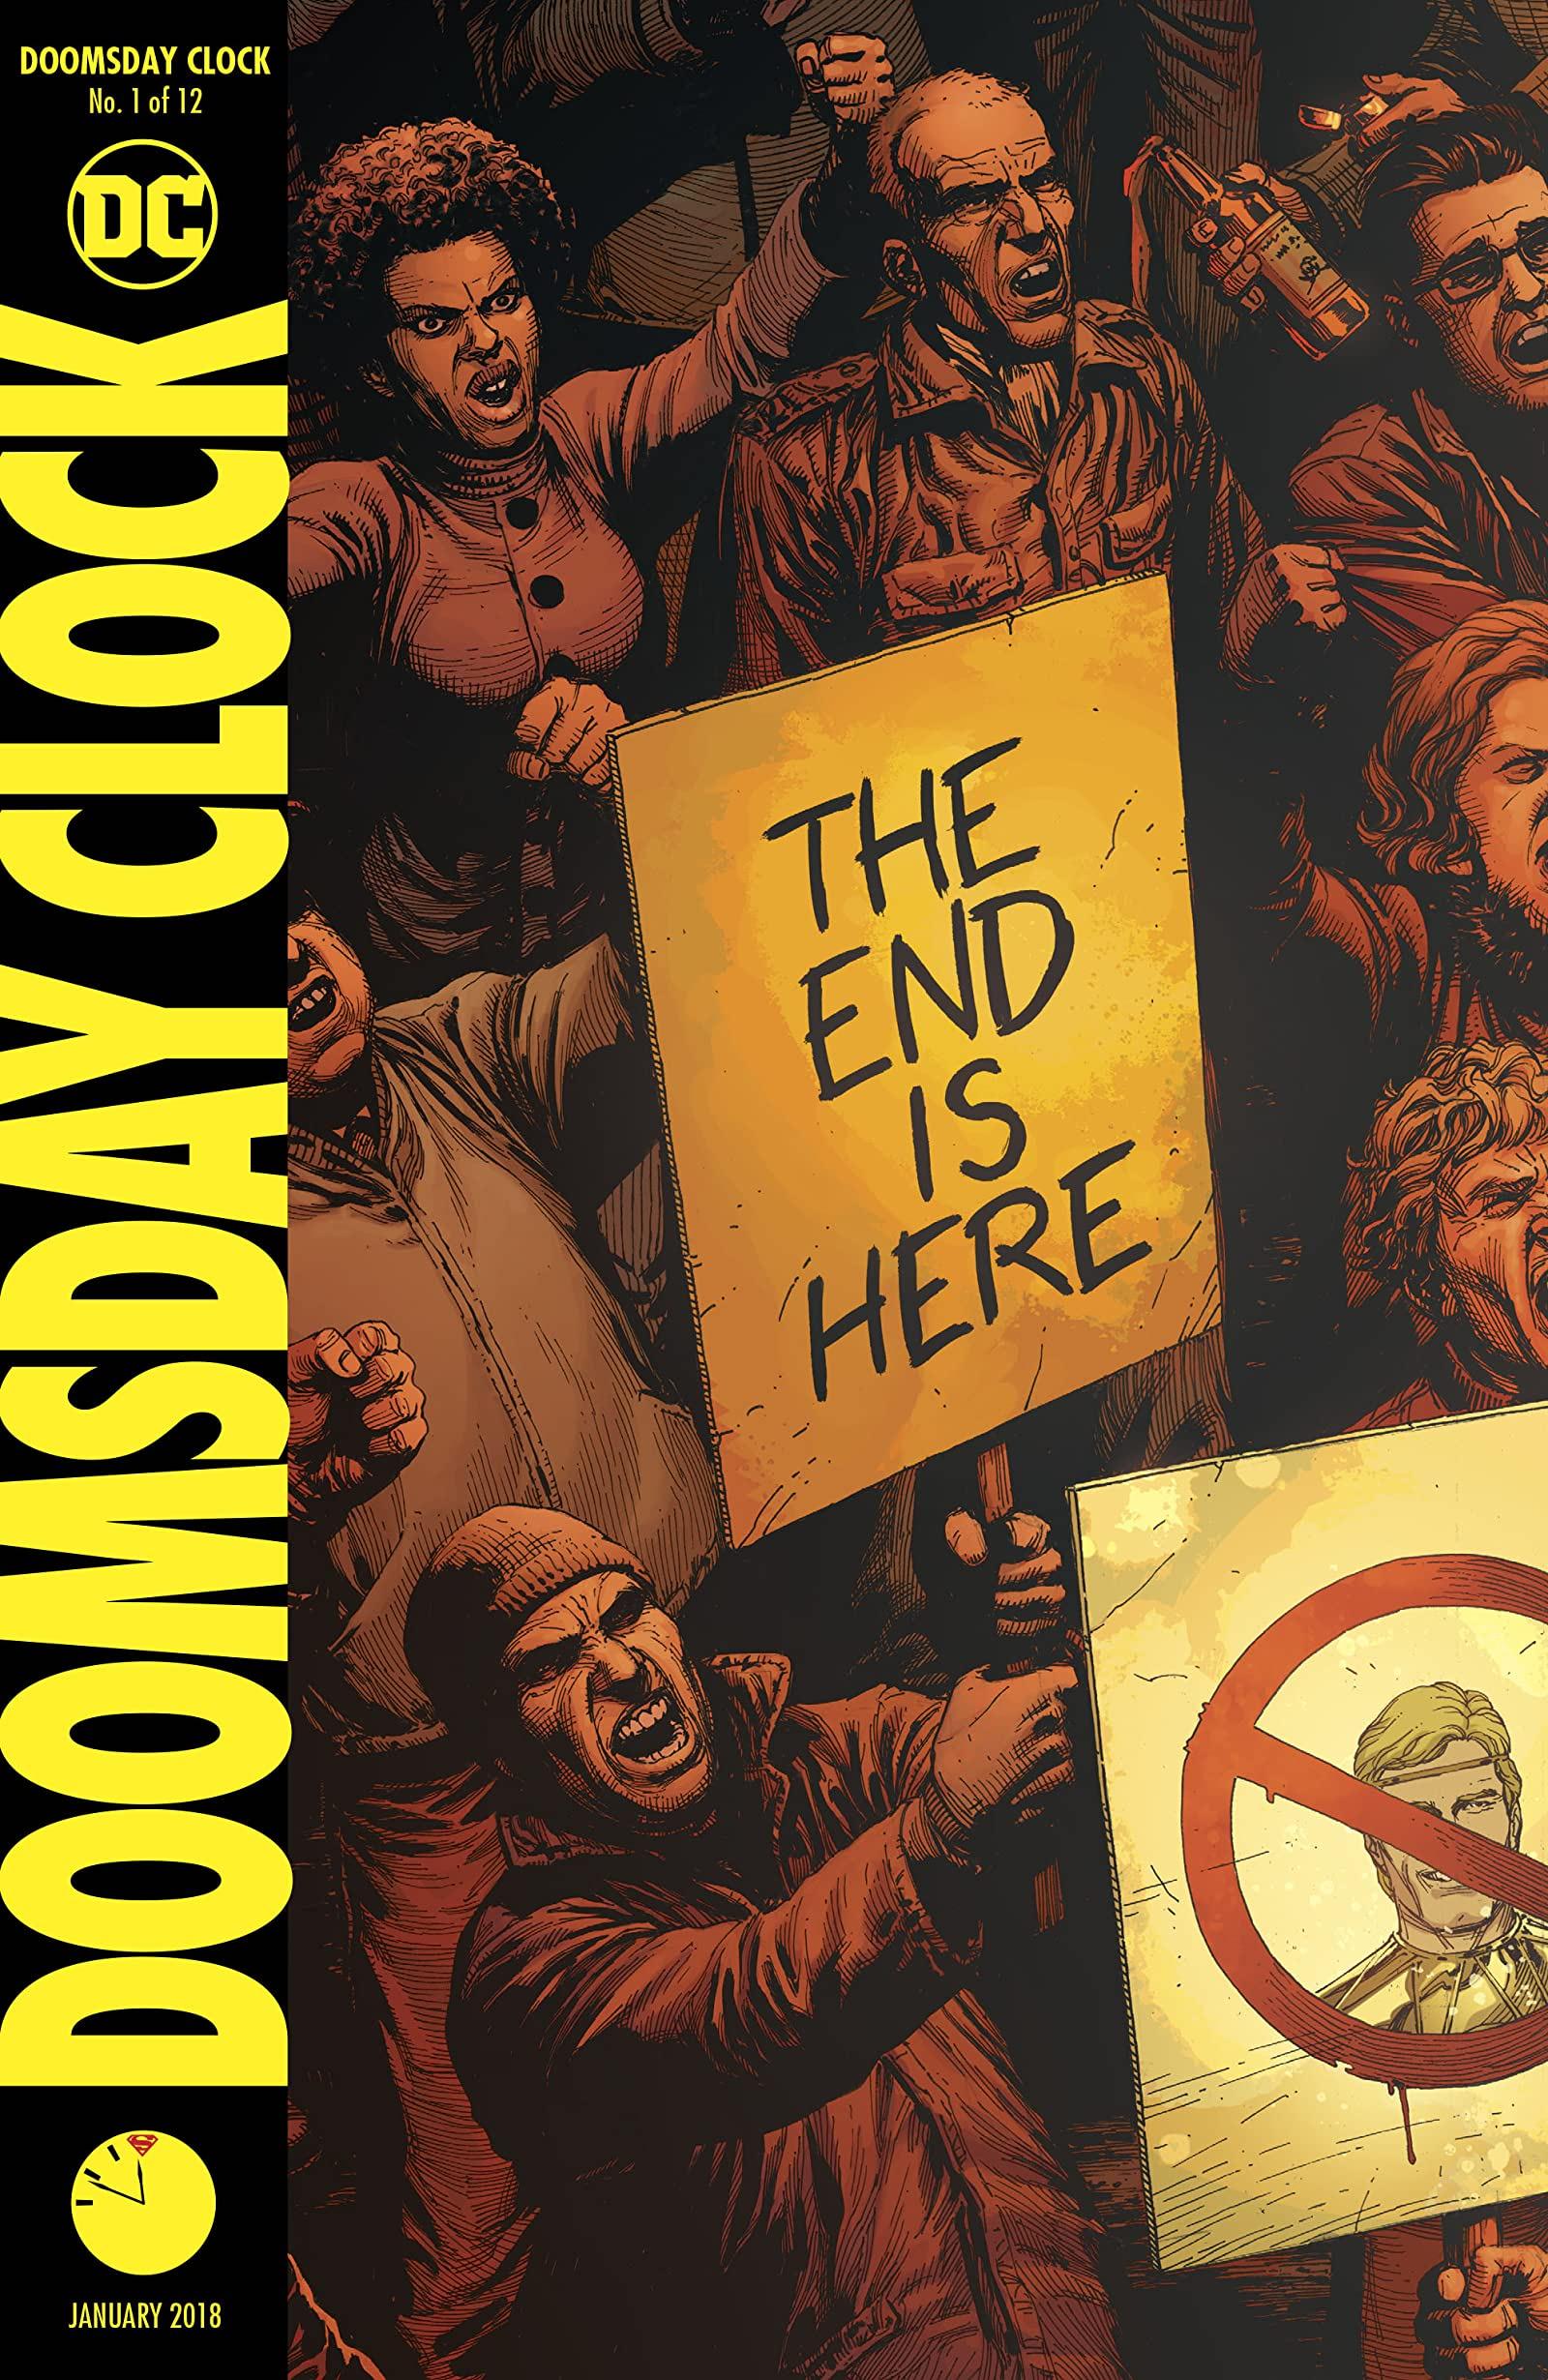 DC Essential Reads Doomsday Clock #1